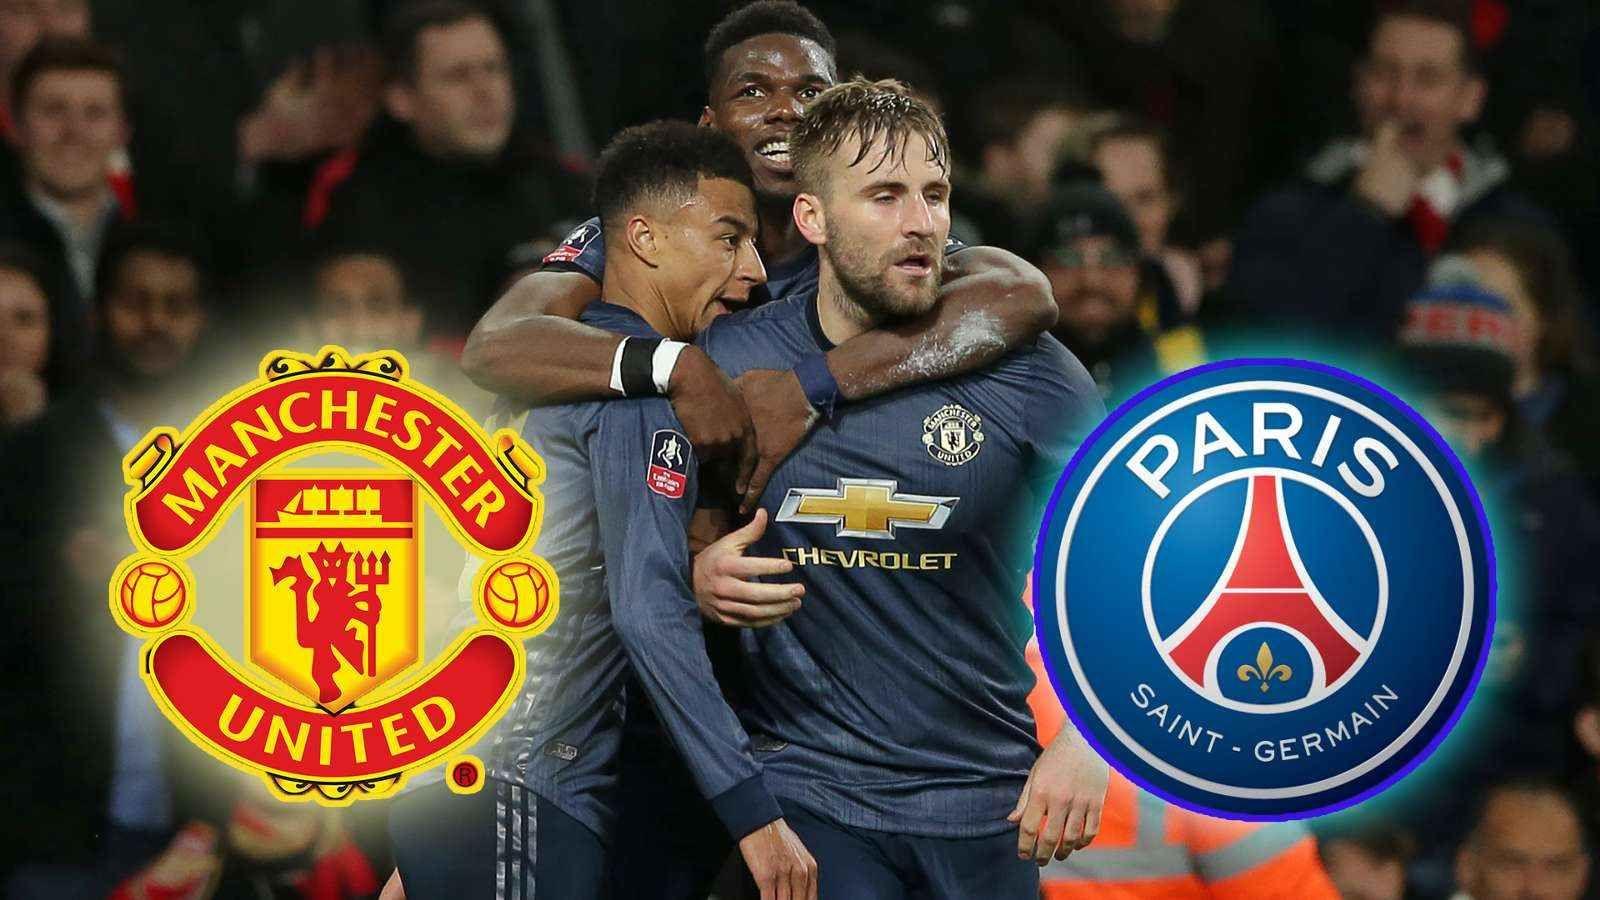 Prima Pagina Psg, Manchester united, Neymar